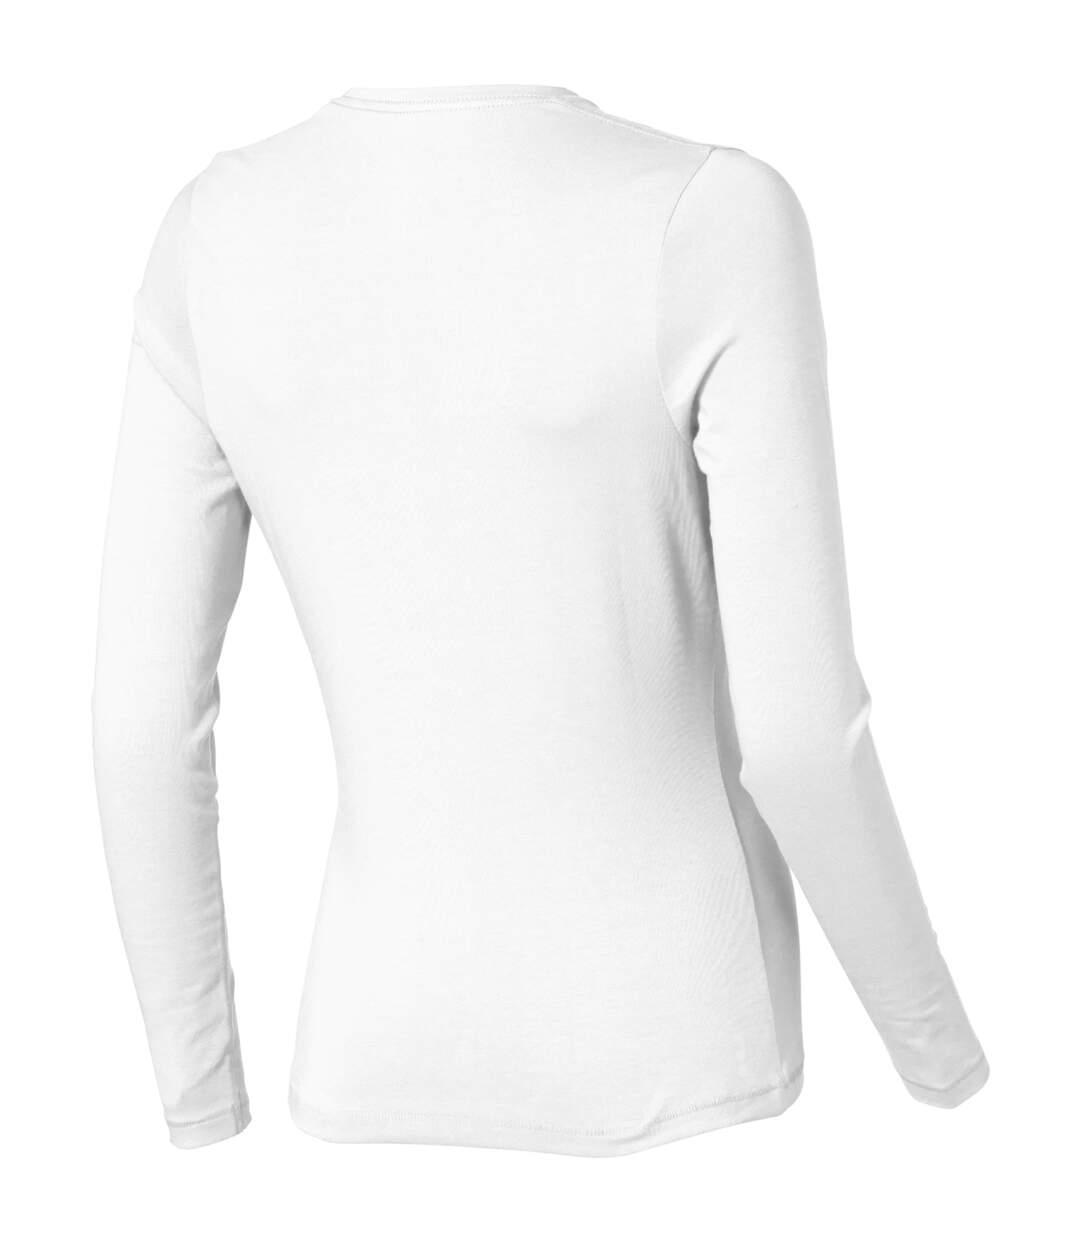 Elevate - T-Shirt Manches Longues Ponoka - Femme (Blanc) - UTPF1812